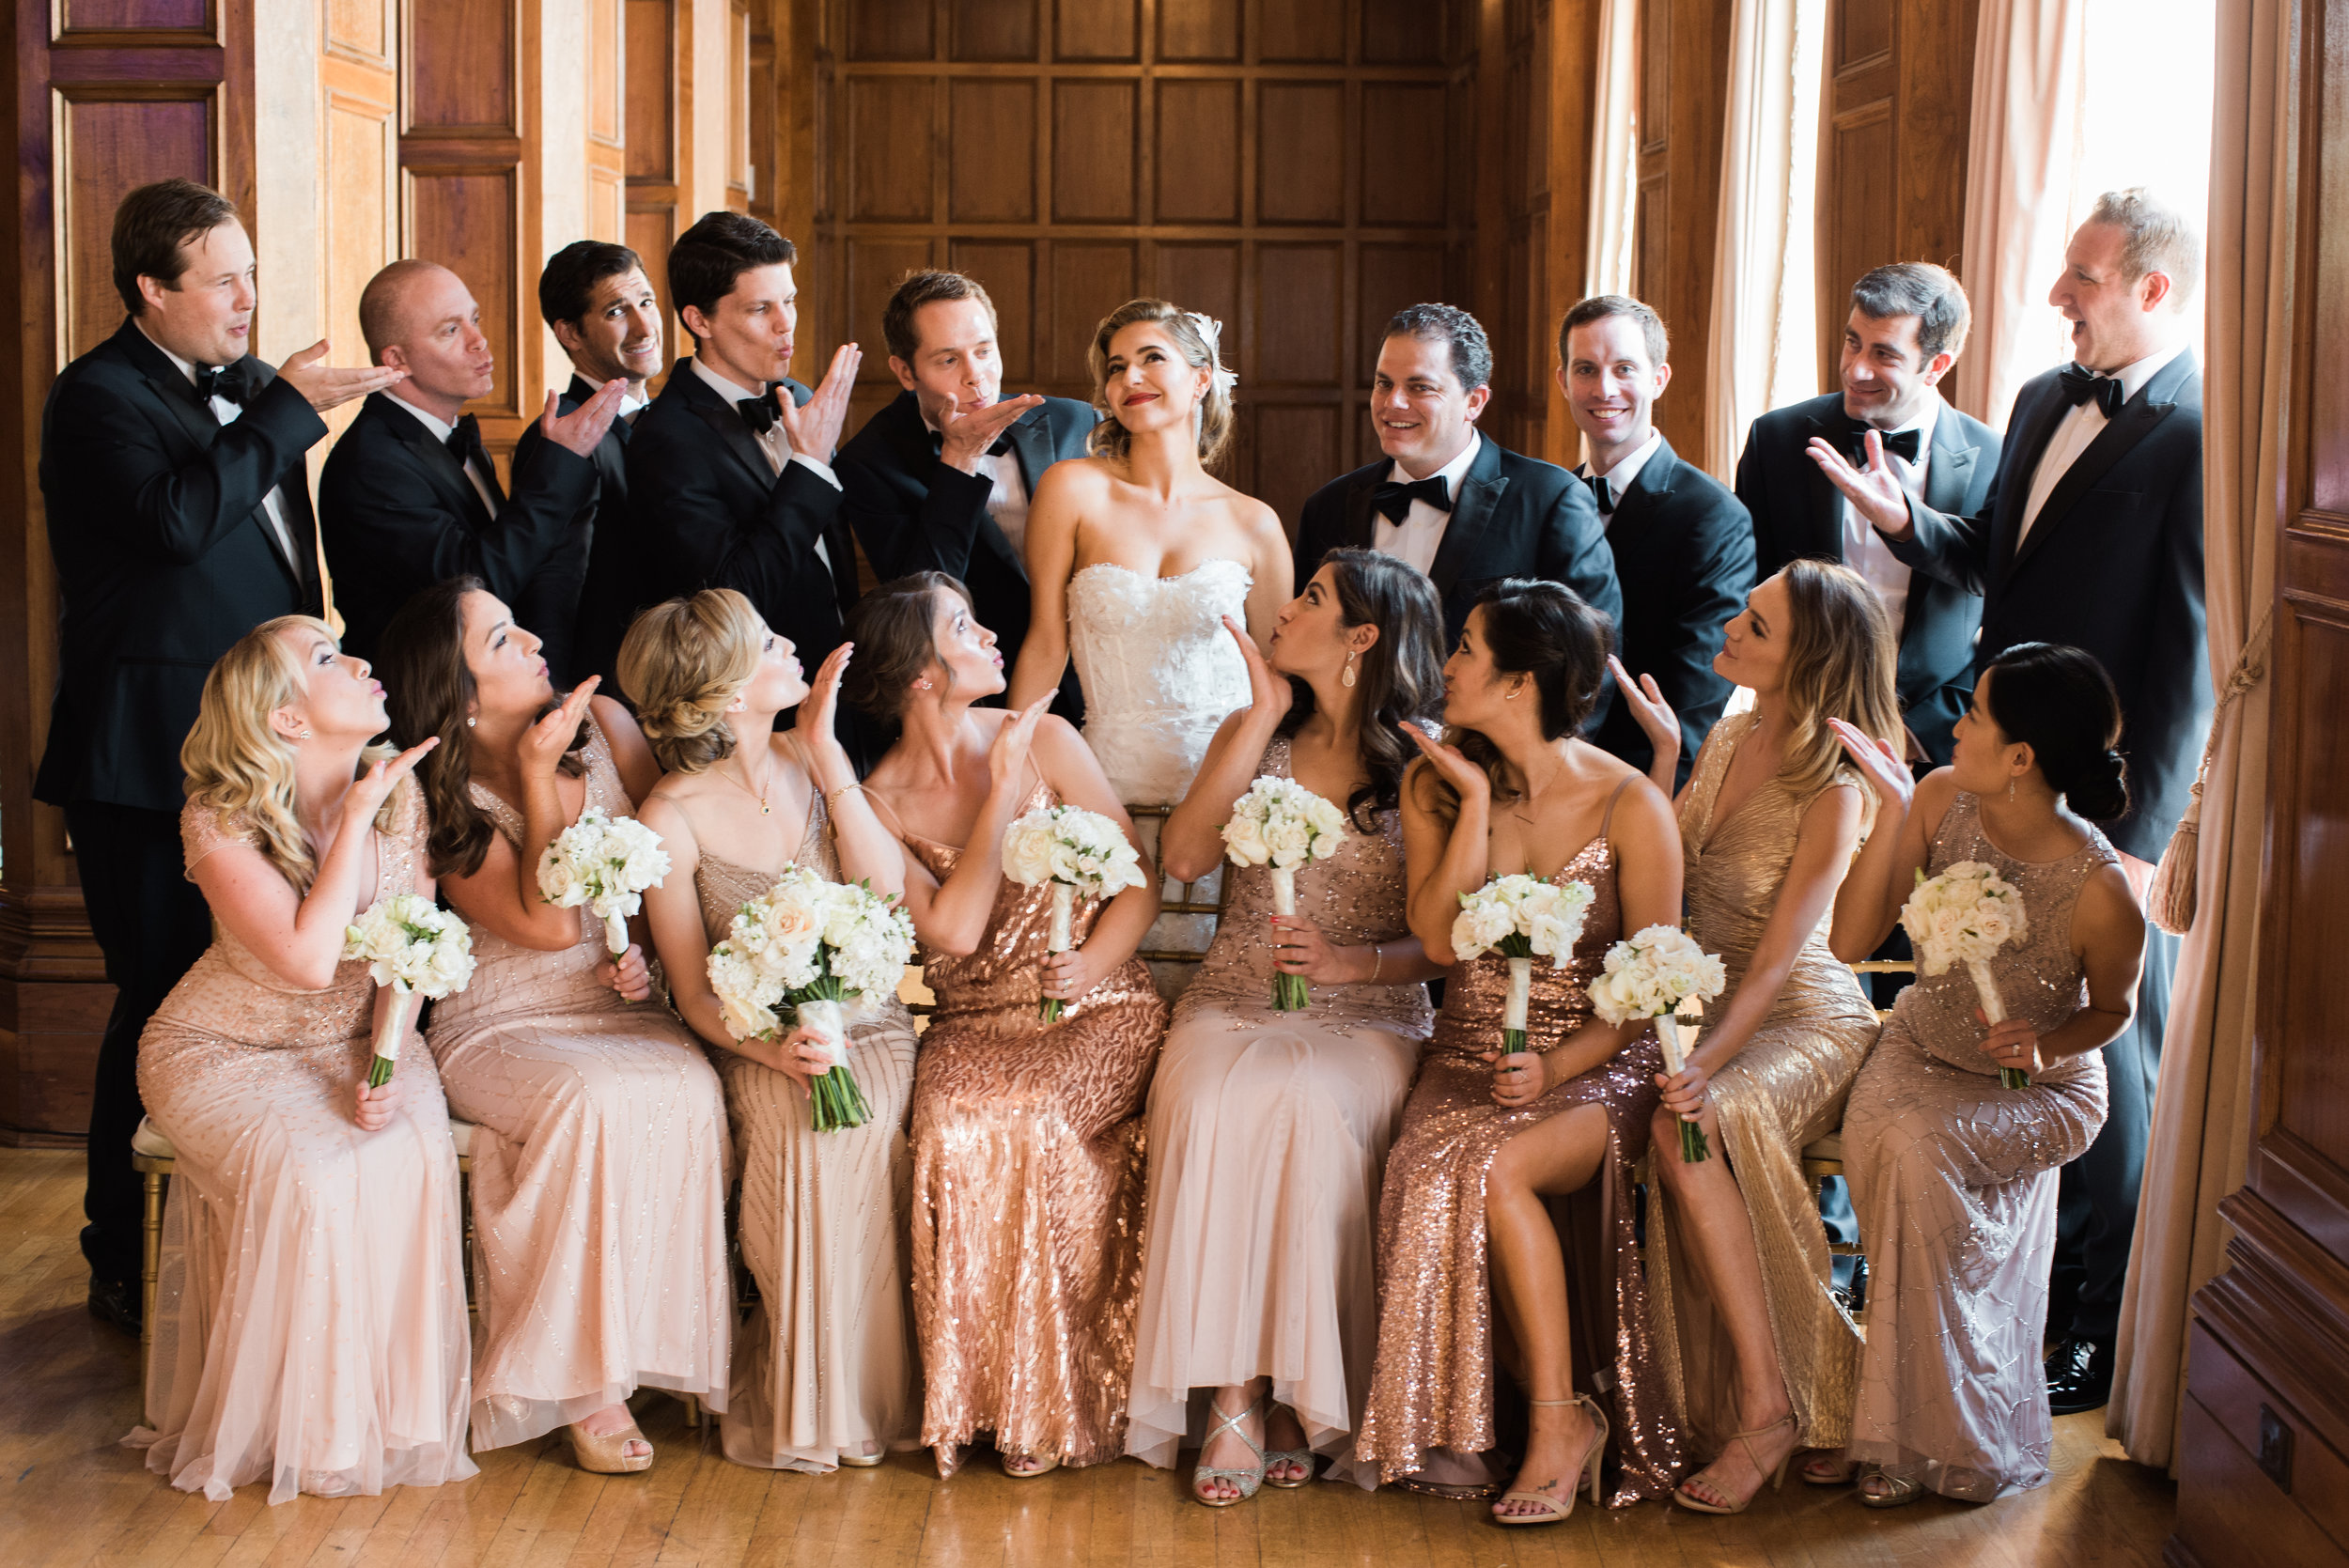 wedding_photographer_greg_ross-030.jpg